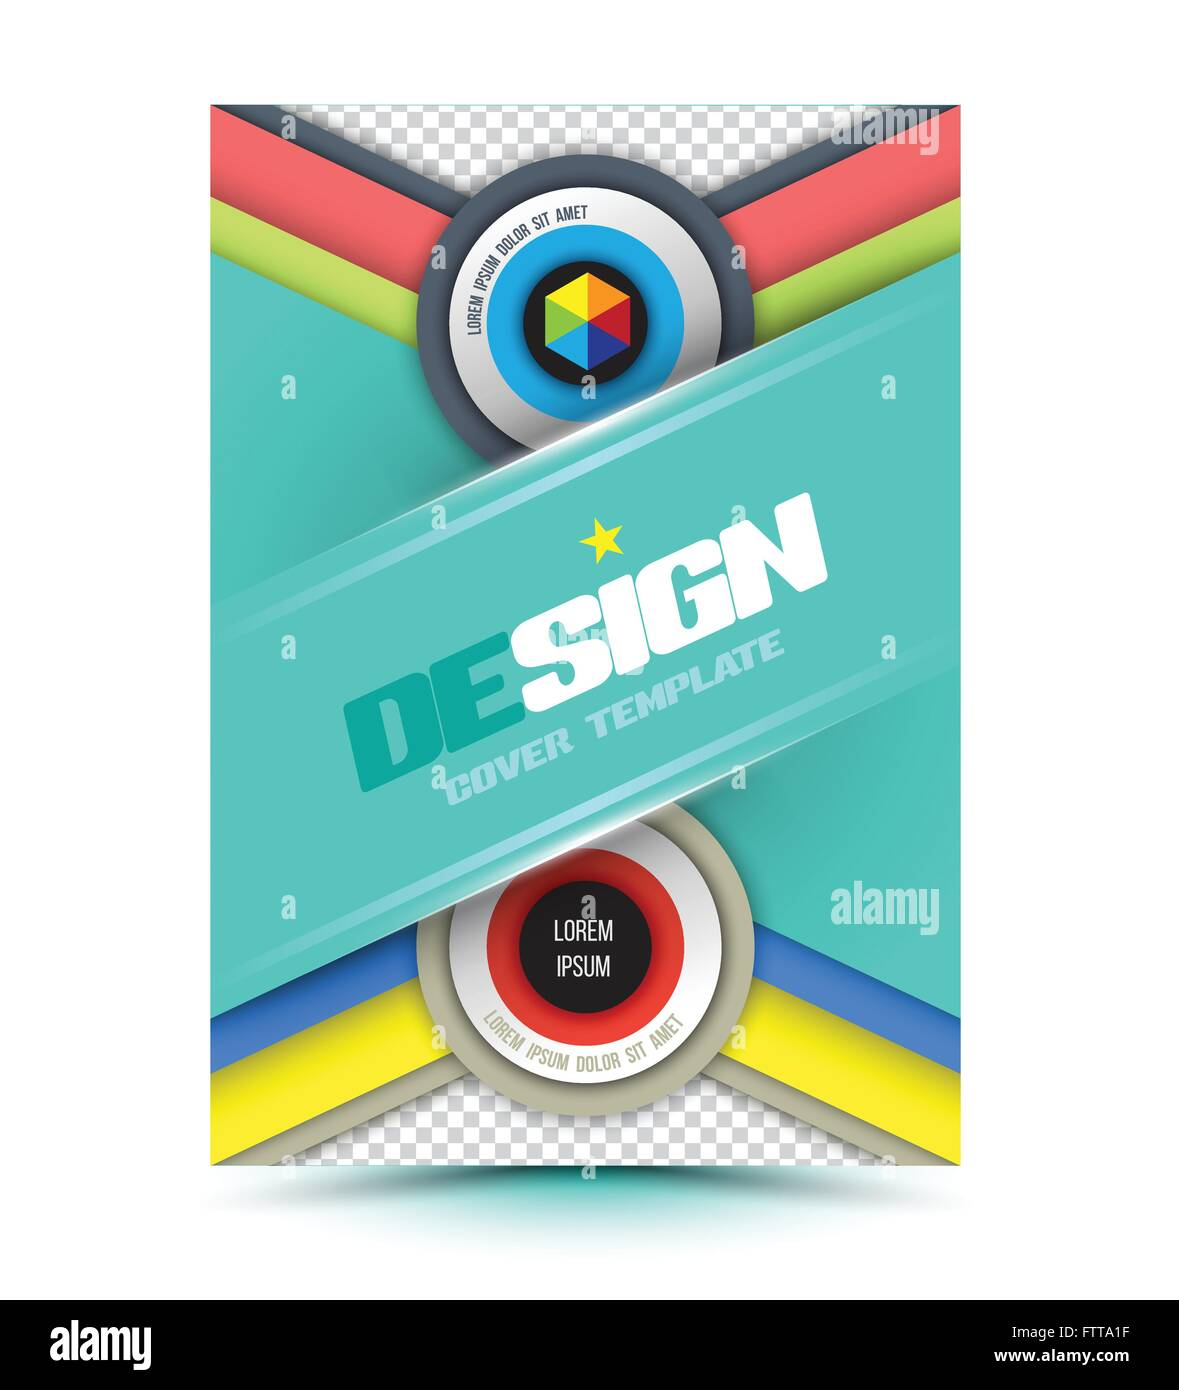 Modernes Design Abstrakt Broschüre. Vektor-Illustration. Buch-Cover ...